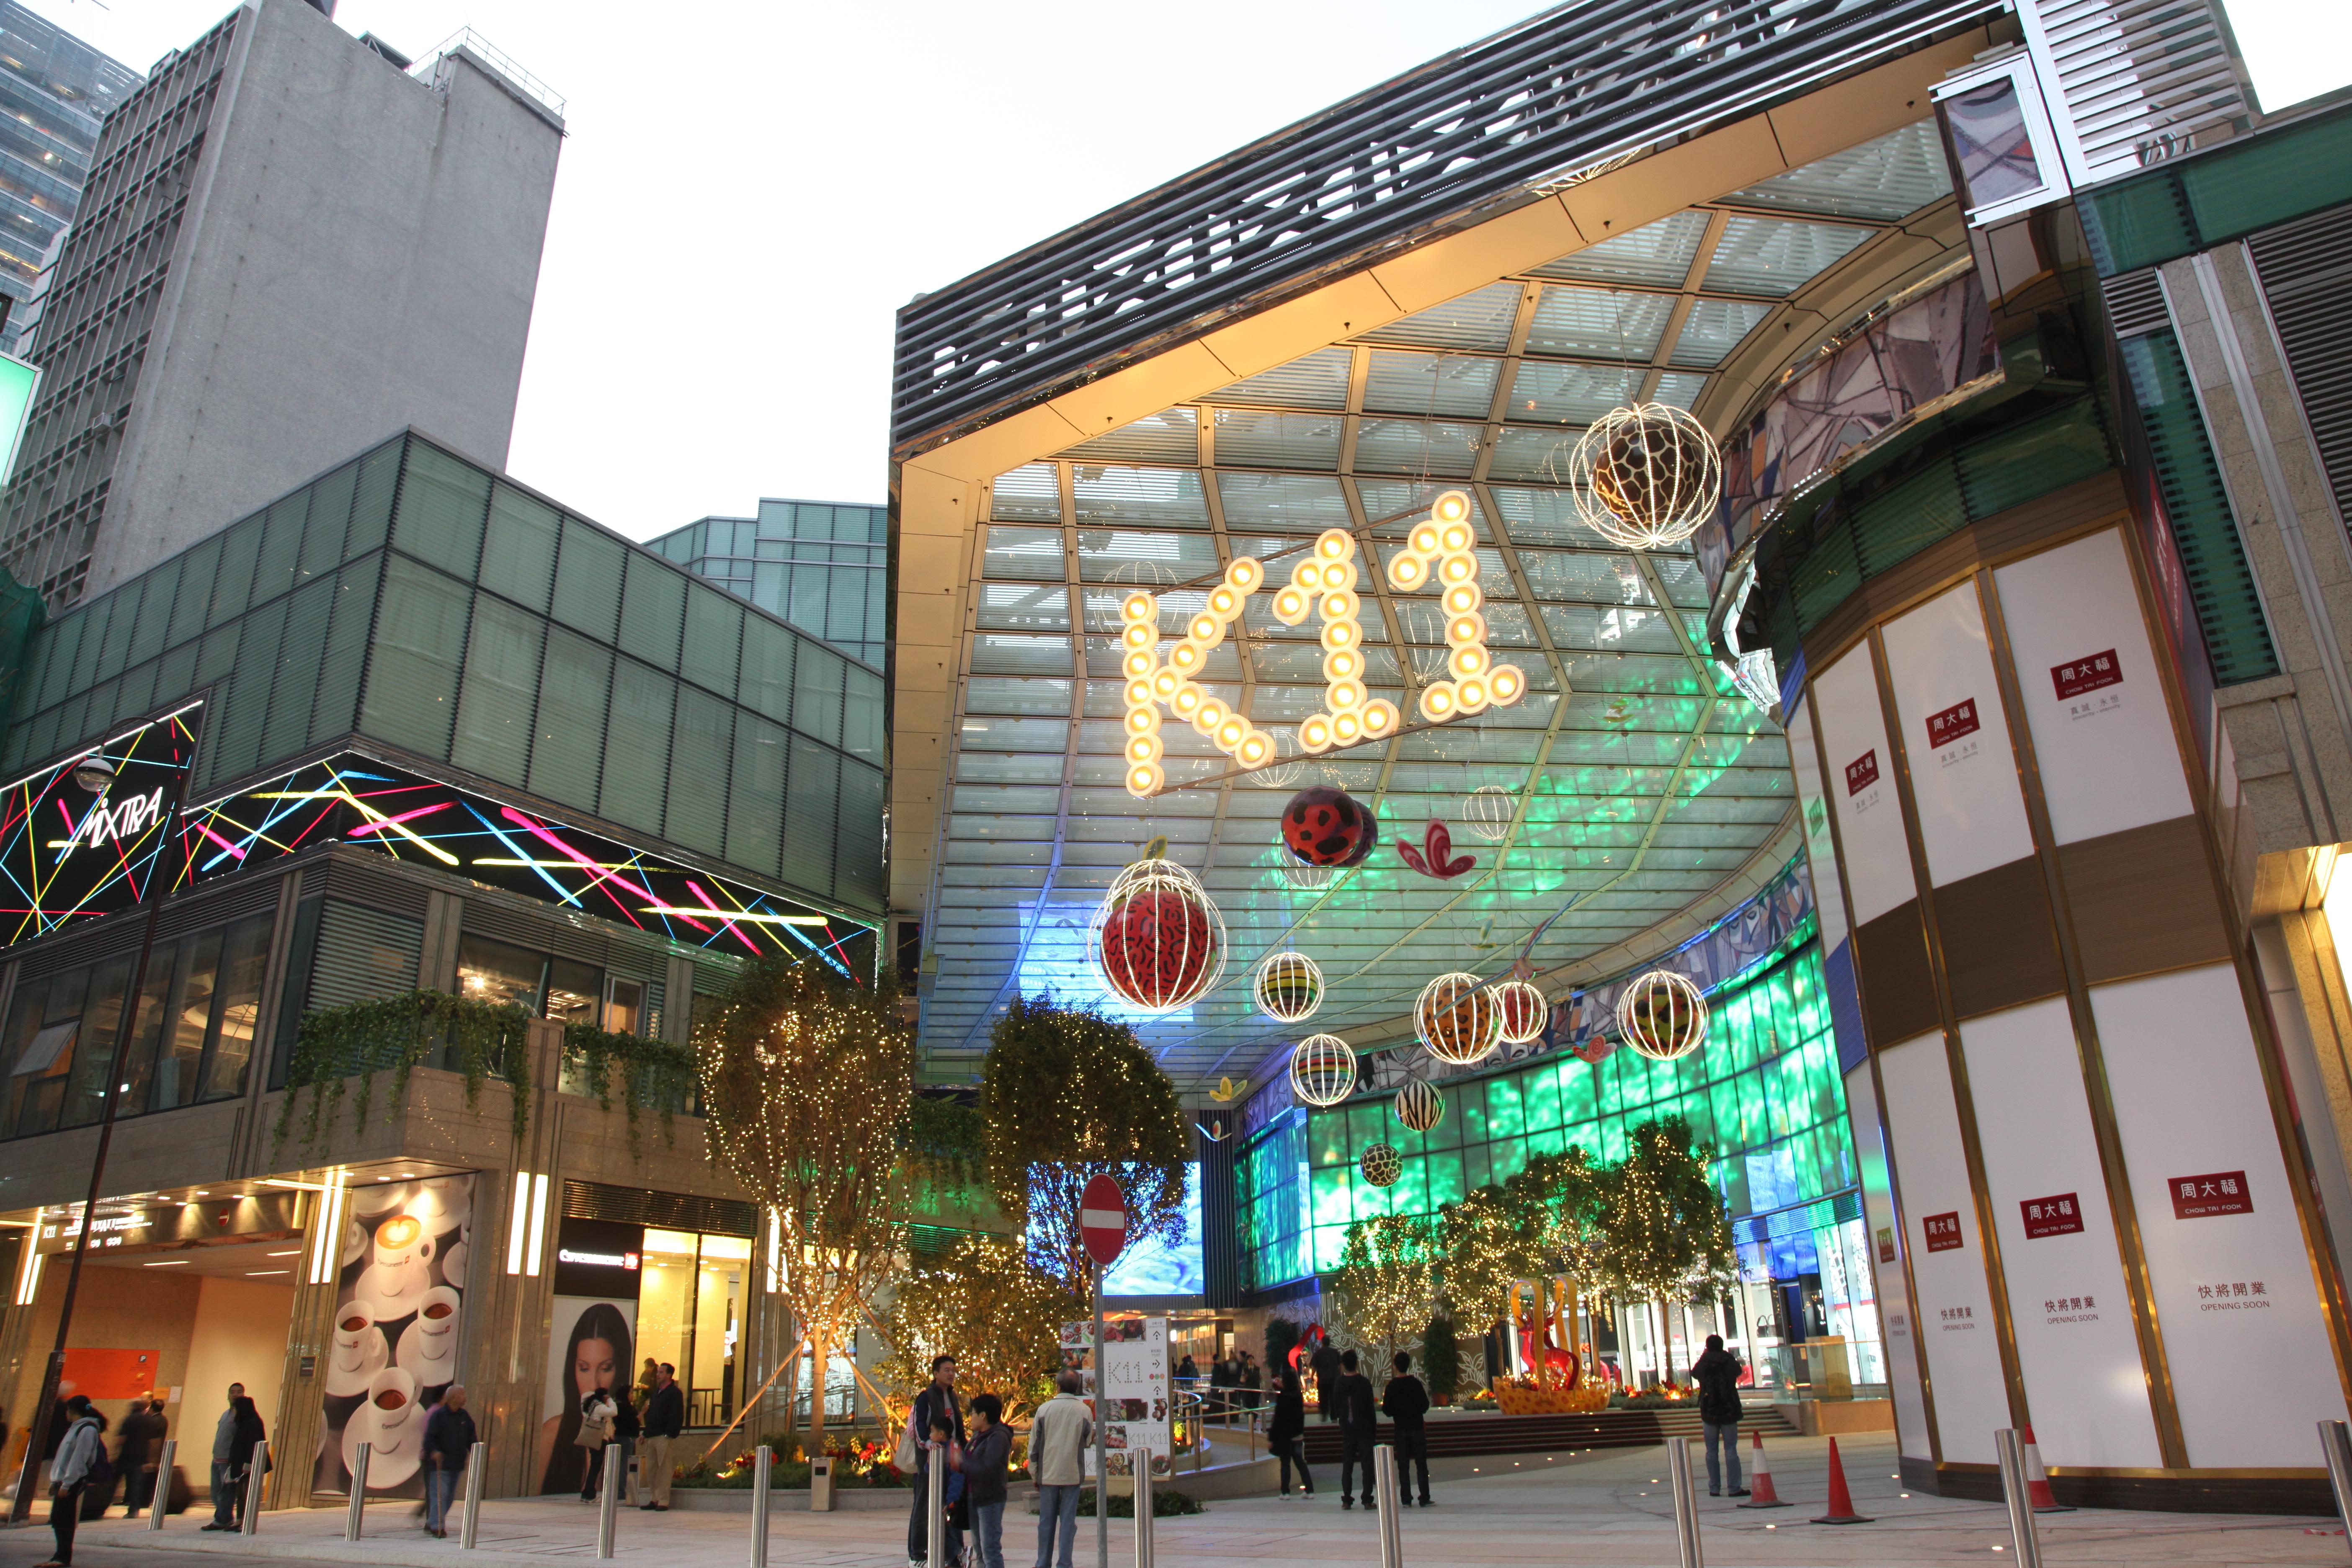 K11 Art Mall, Shanghai